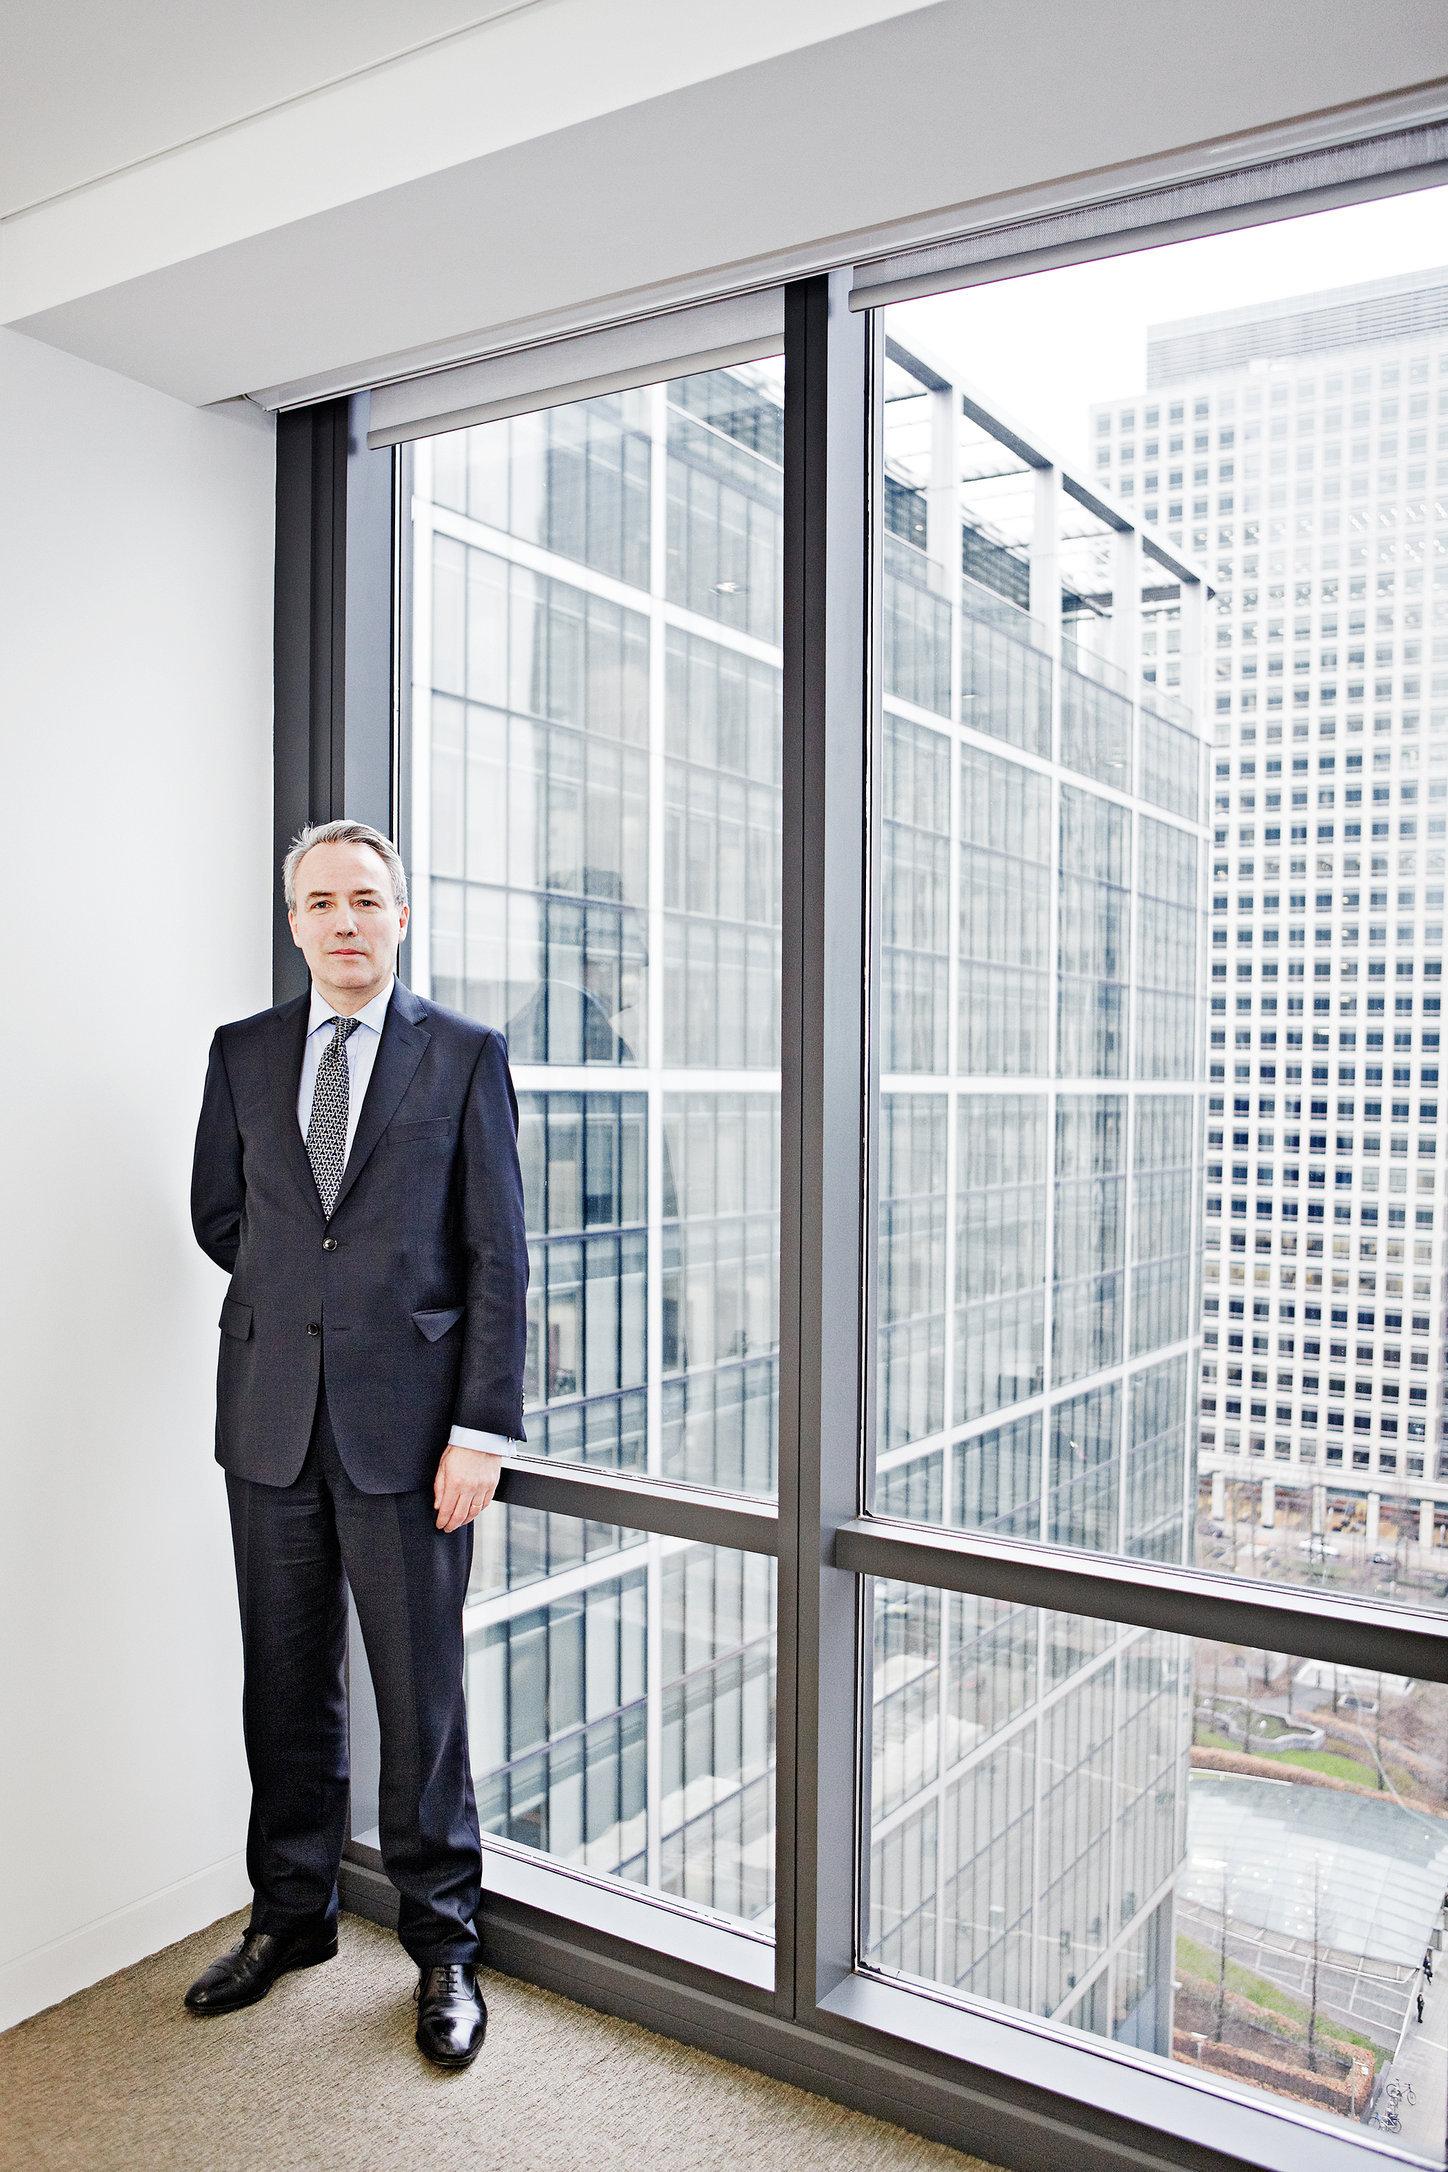 Michel Madelaine, Moody's